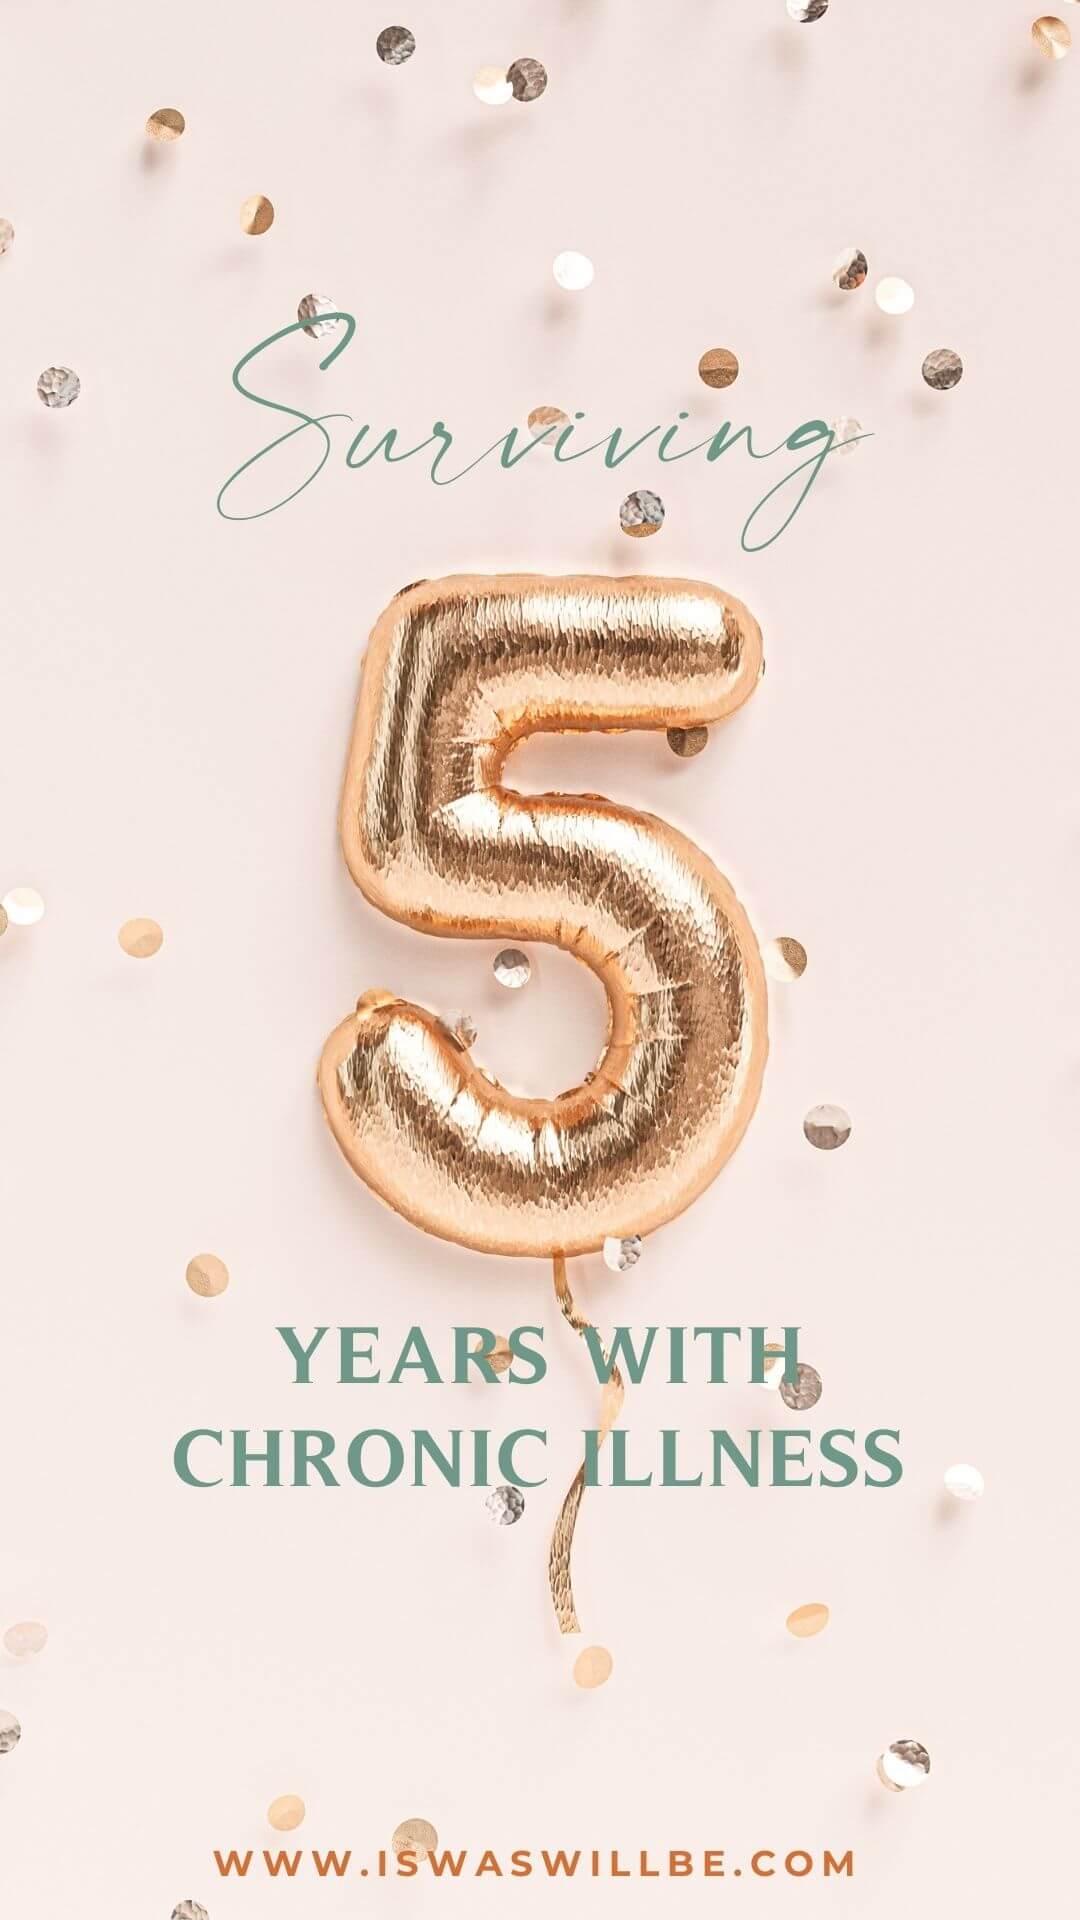 5 years with chronic illness